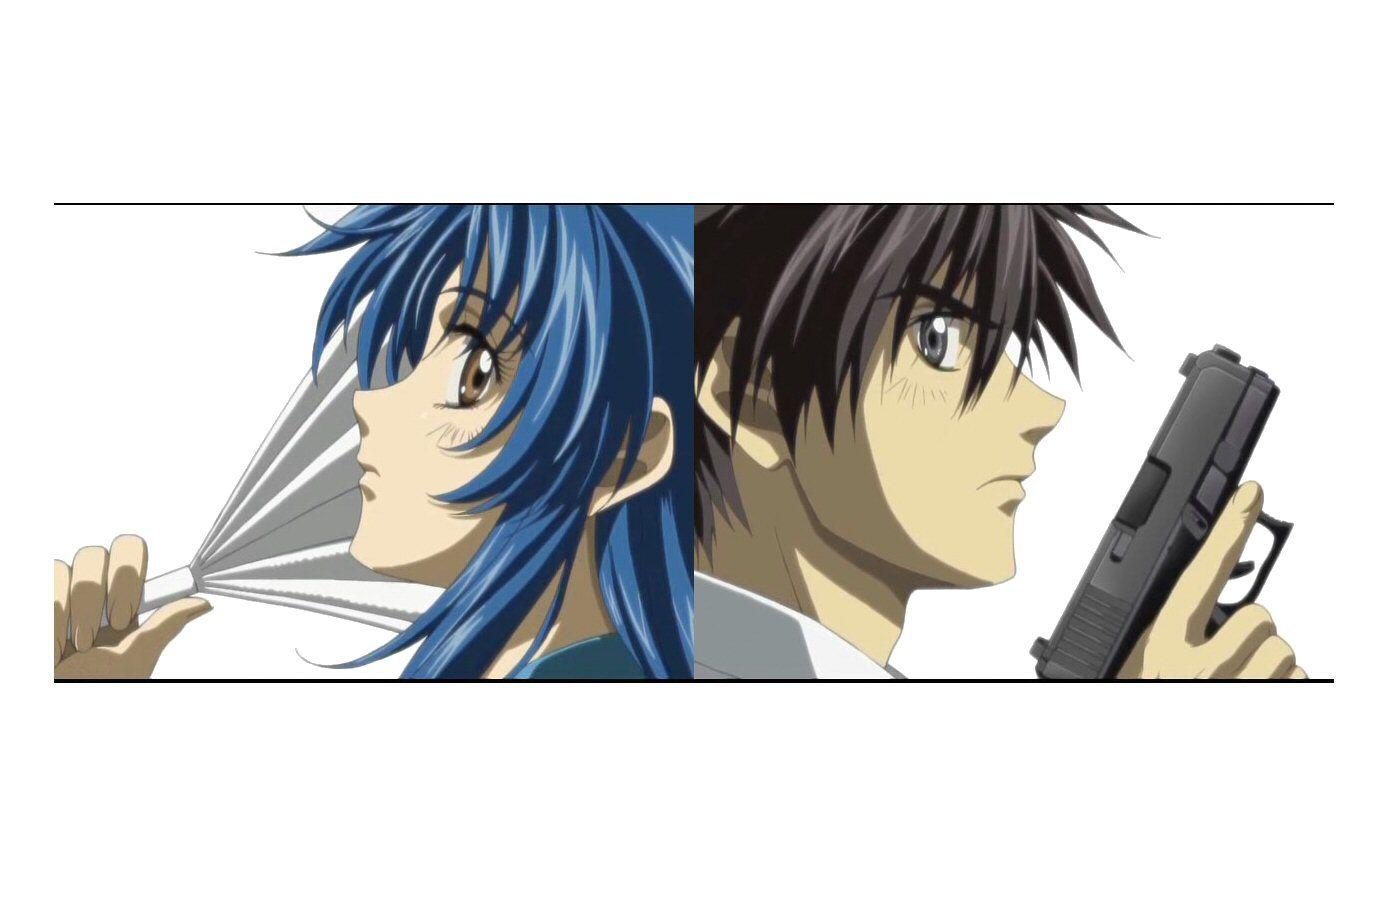 Pin By Amy Gagel On Not So Secret Geek Interests Full Metal Panic Anime Wallpaper Anime